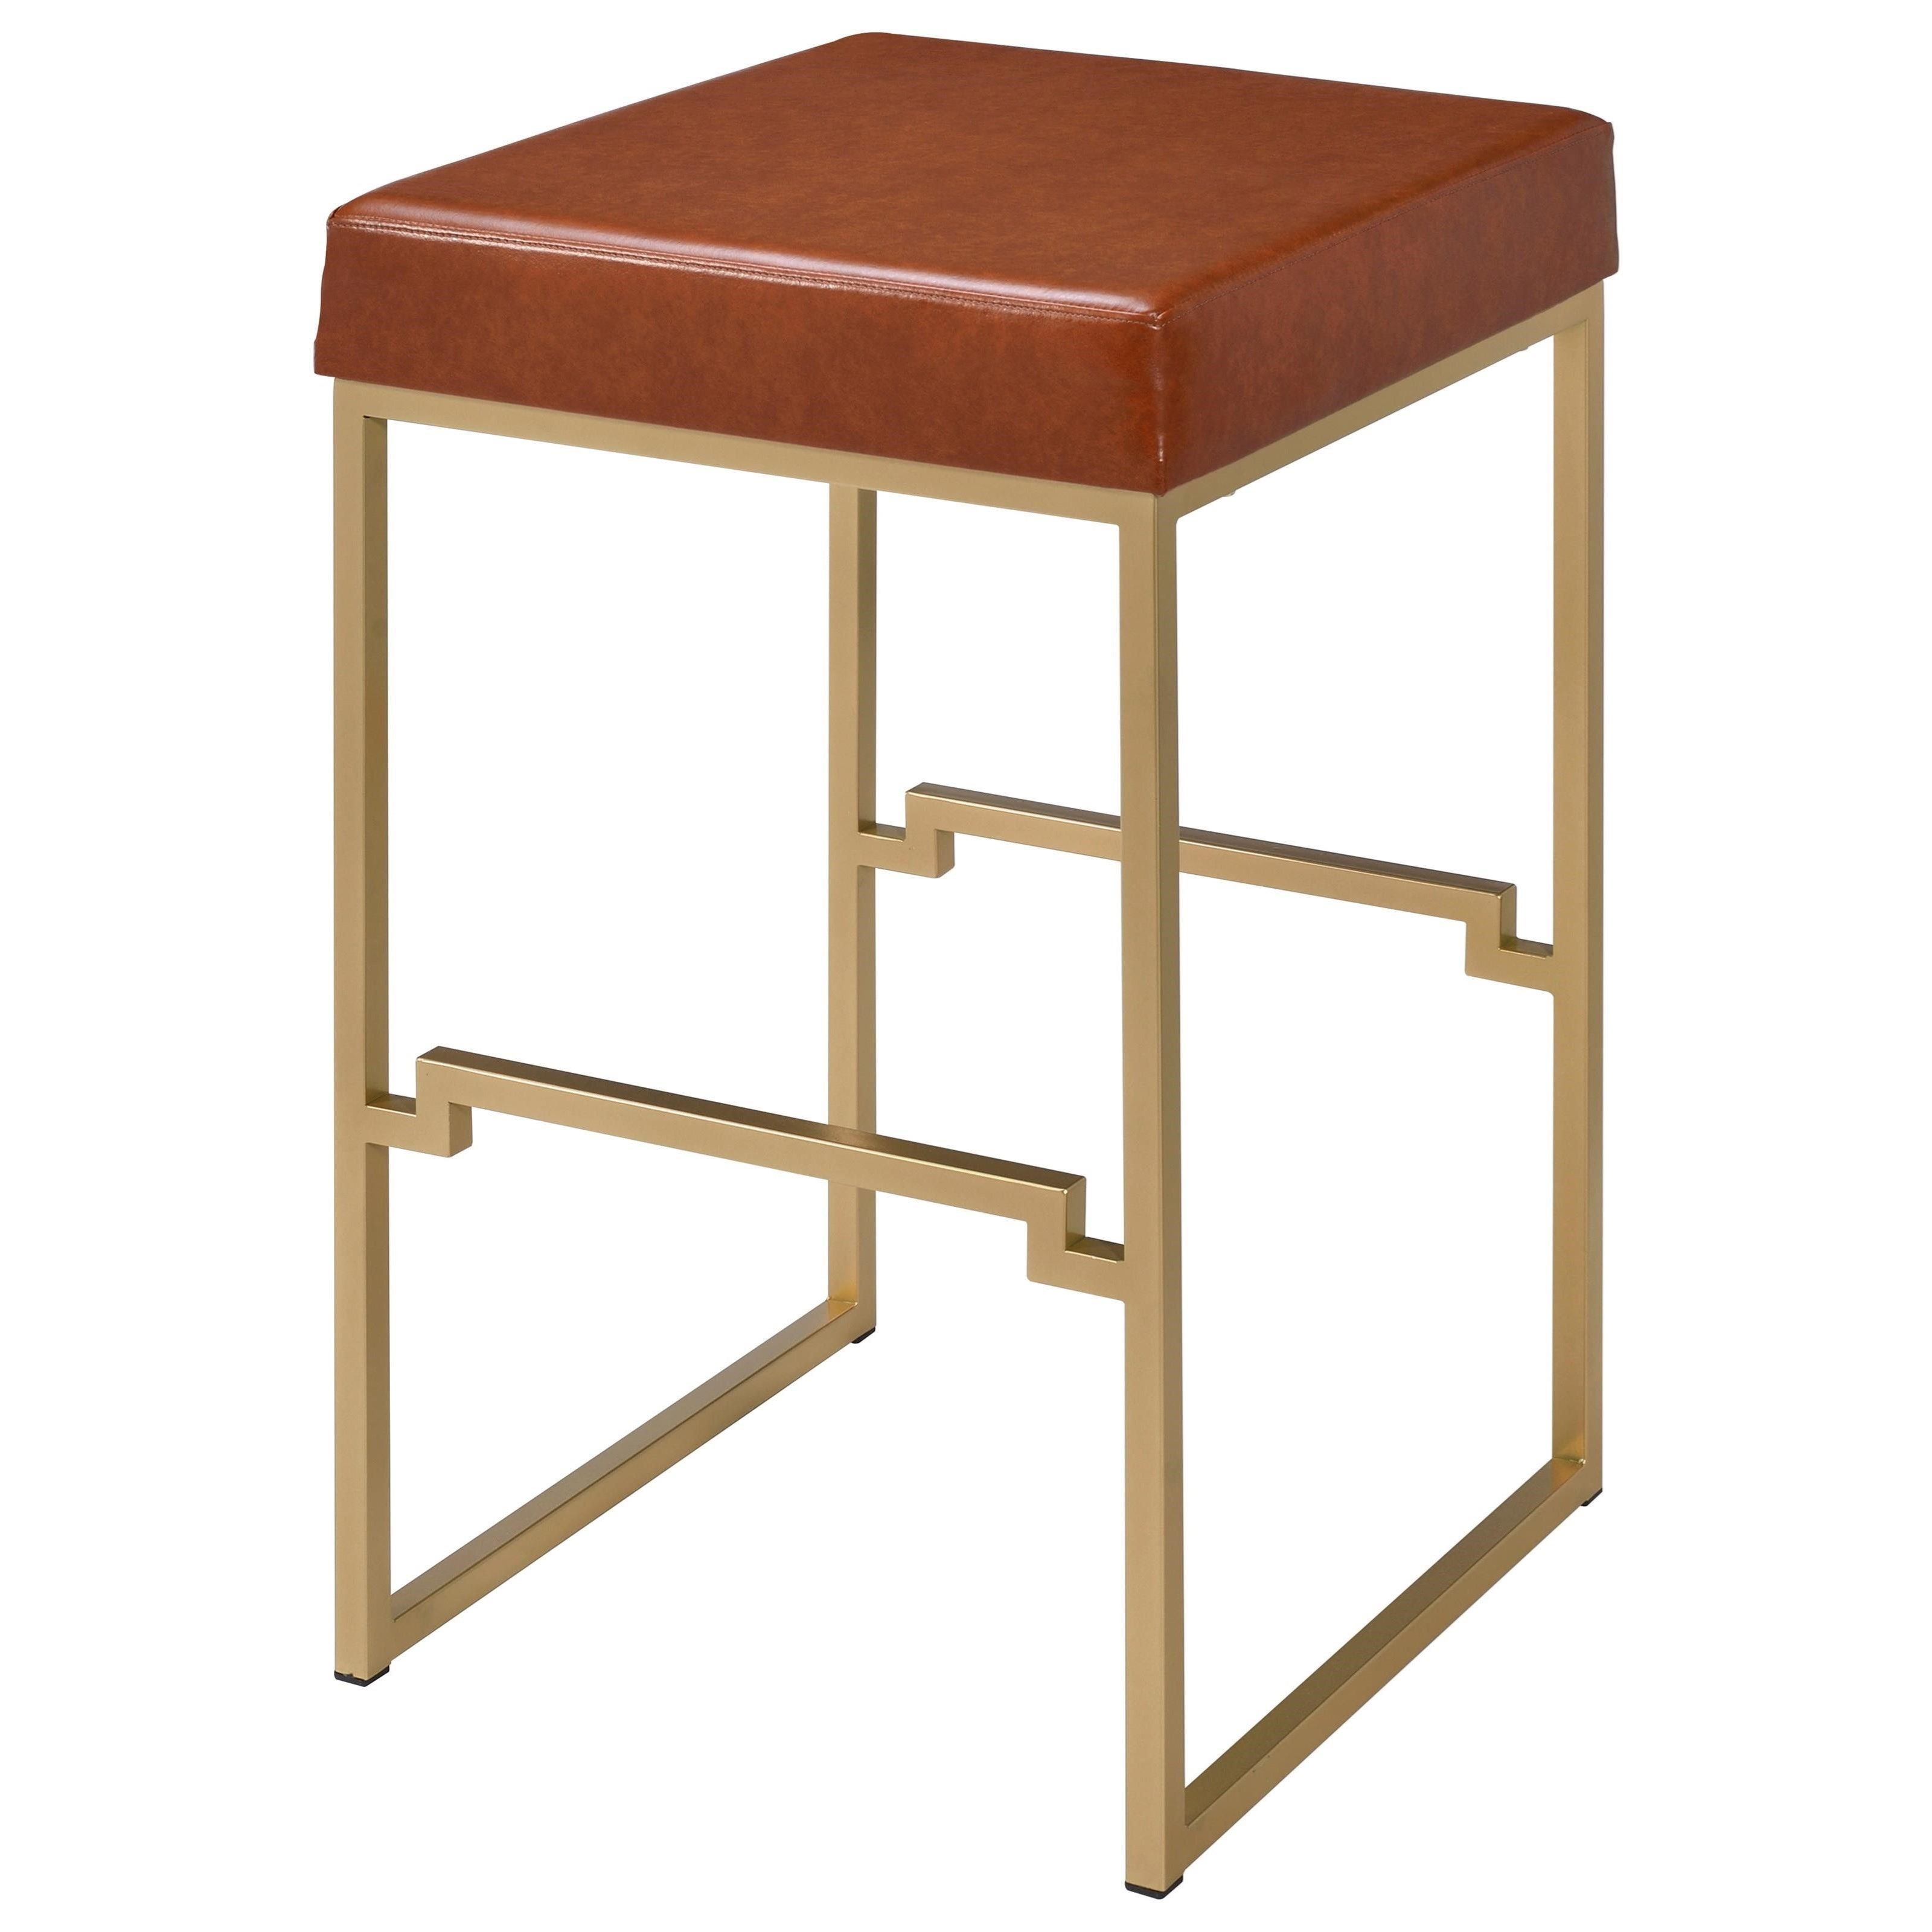 Boice Bar Stool by Acme Furniture at Carolina Direct